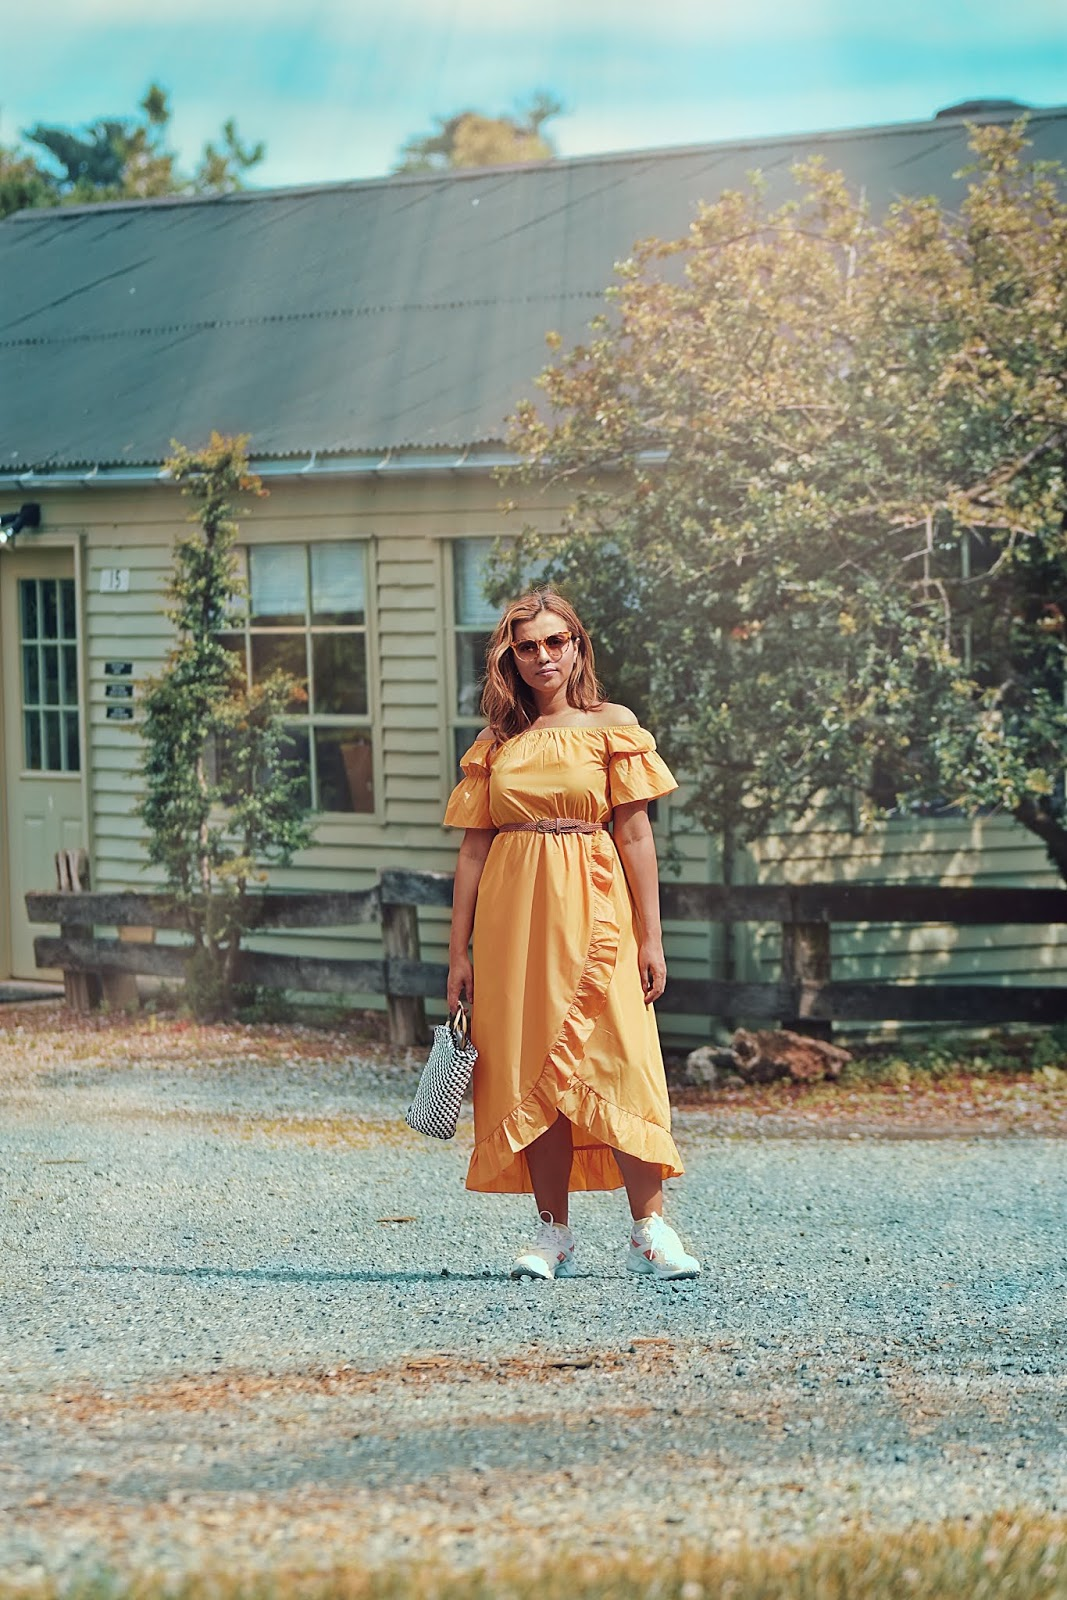 Vestido Con Hombros Descubiertos Y Volantes by Mari Estilo-Reebok-mariestilo-streetstyle-fashionblogger-reebok shoes-dcblogger-yellow dress-shein-sheingals-modaelsalvador-loschuchis-armandhugon-moda-